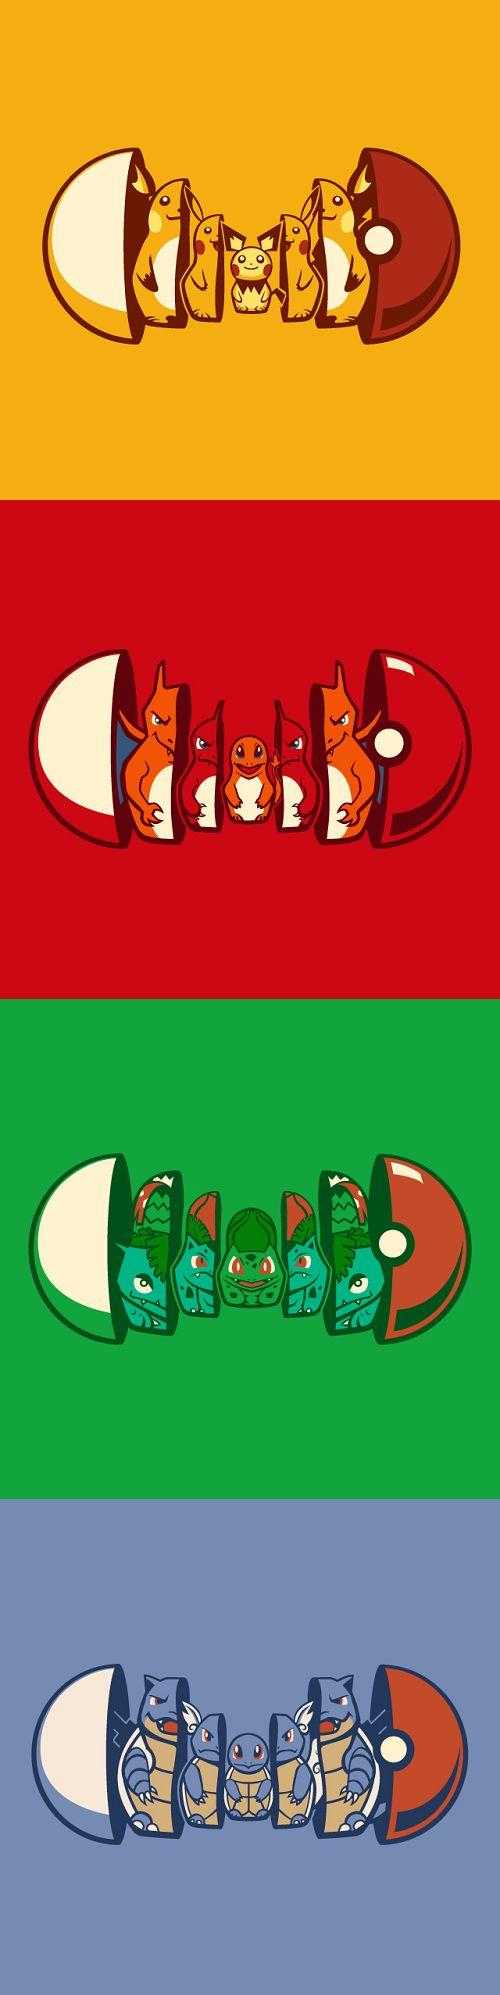 The best images about pokemon on pinterest nintendo pokemon